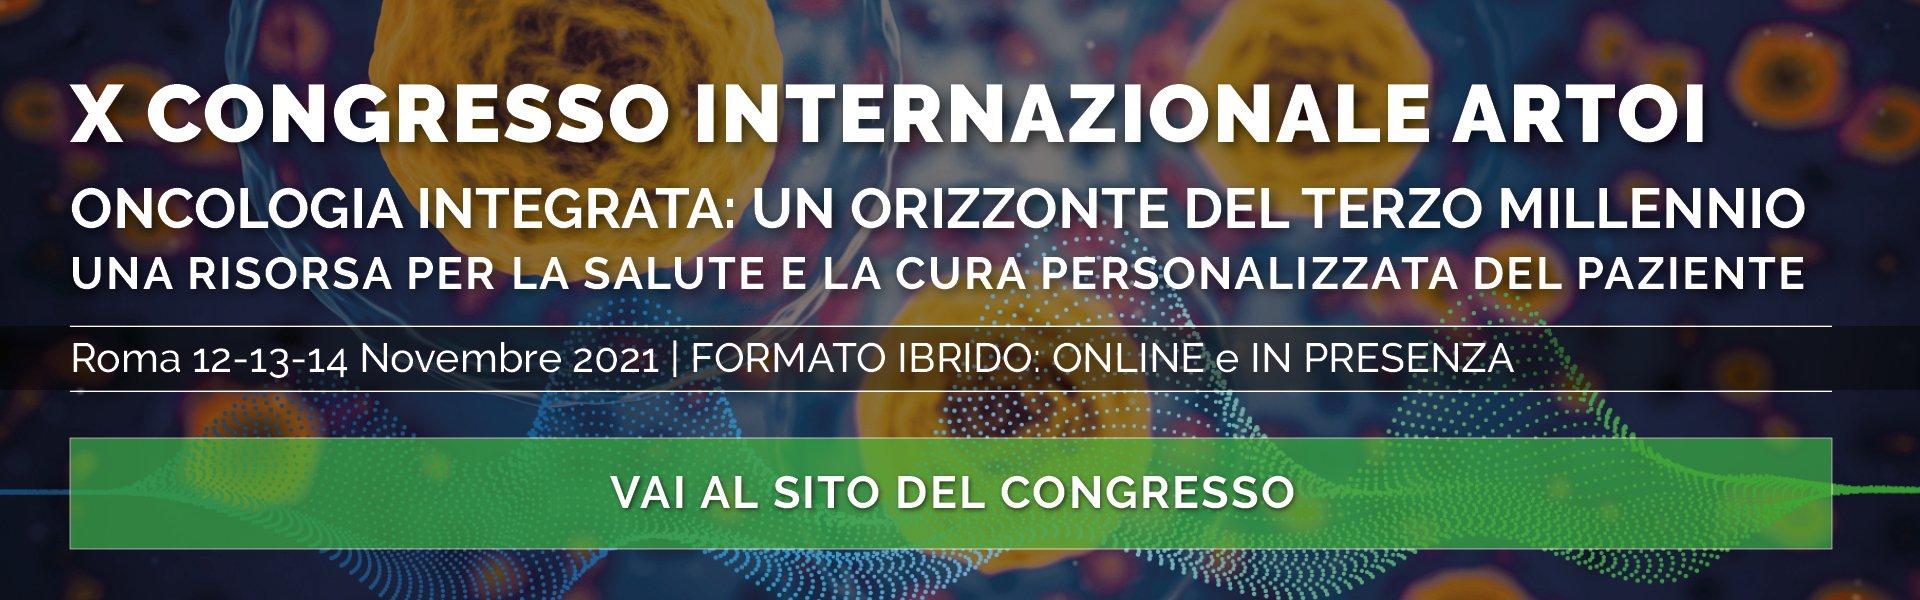 X INTERNATIONAL ARTOI CONGRESS